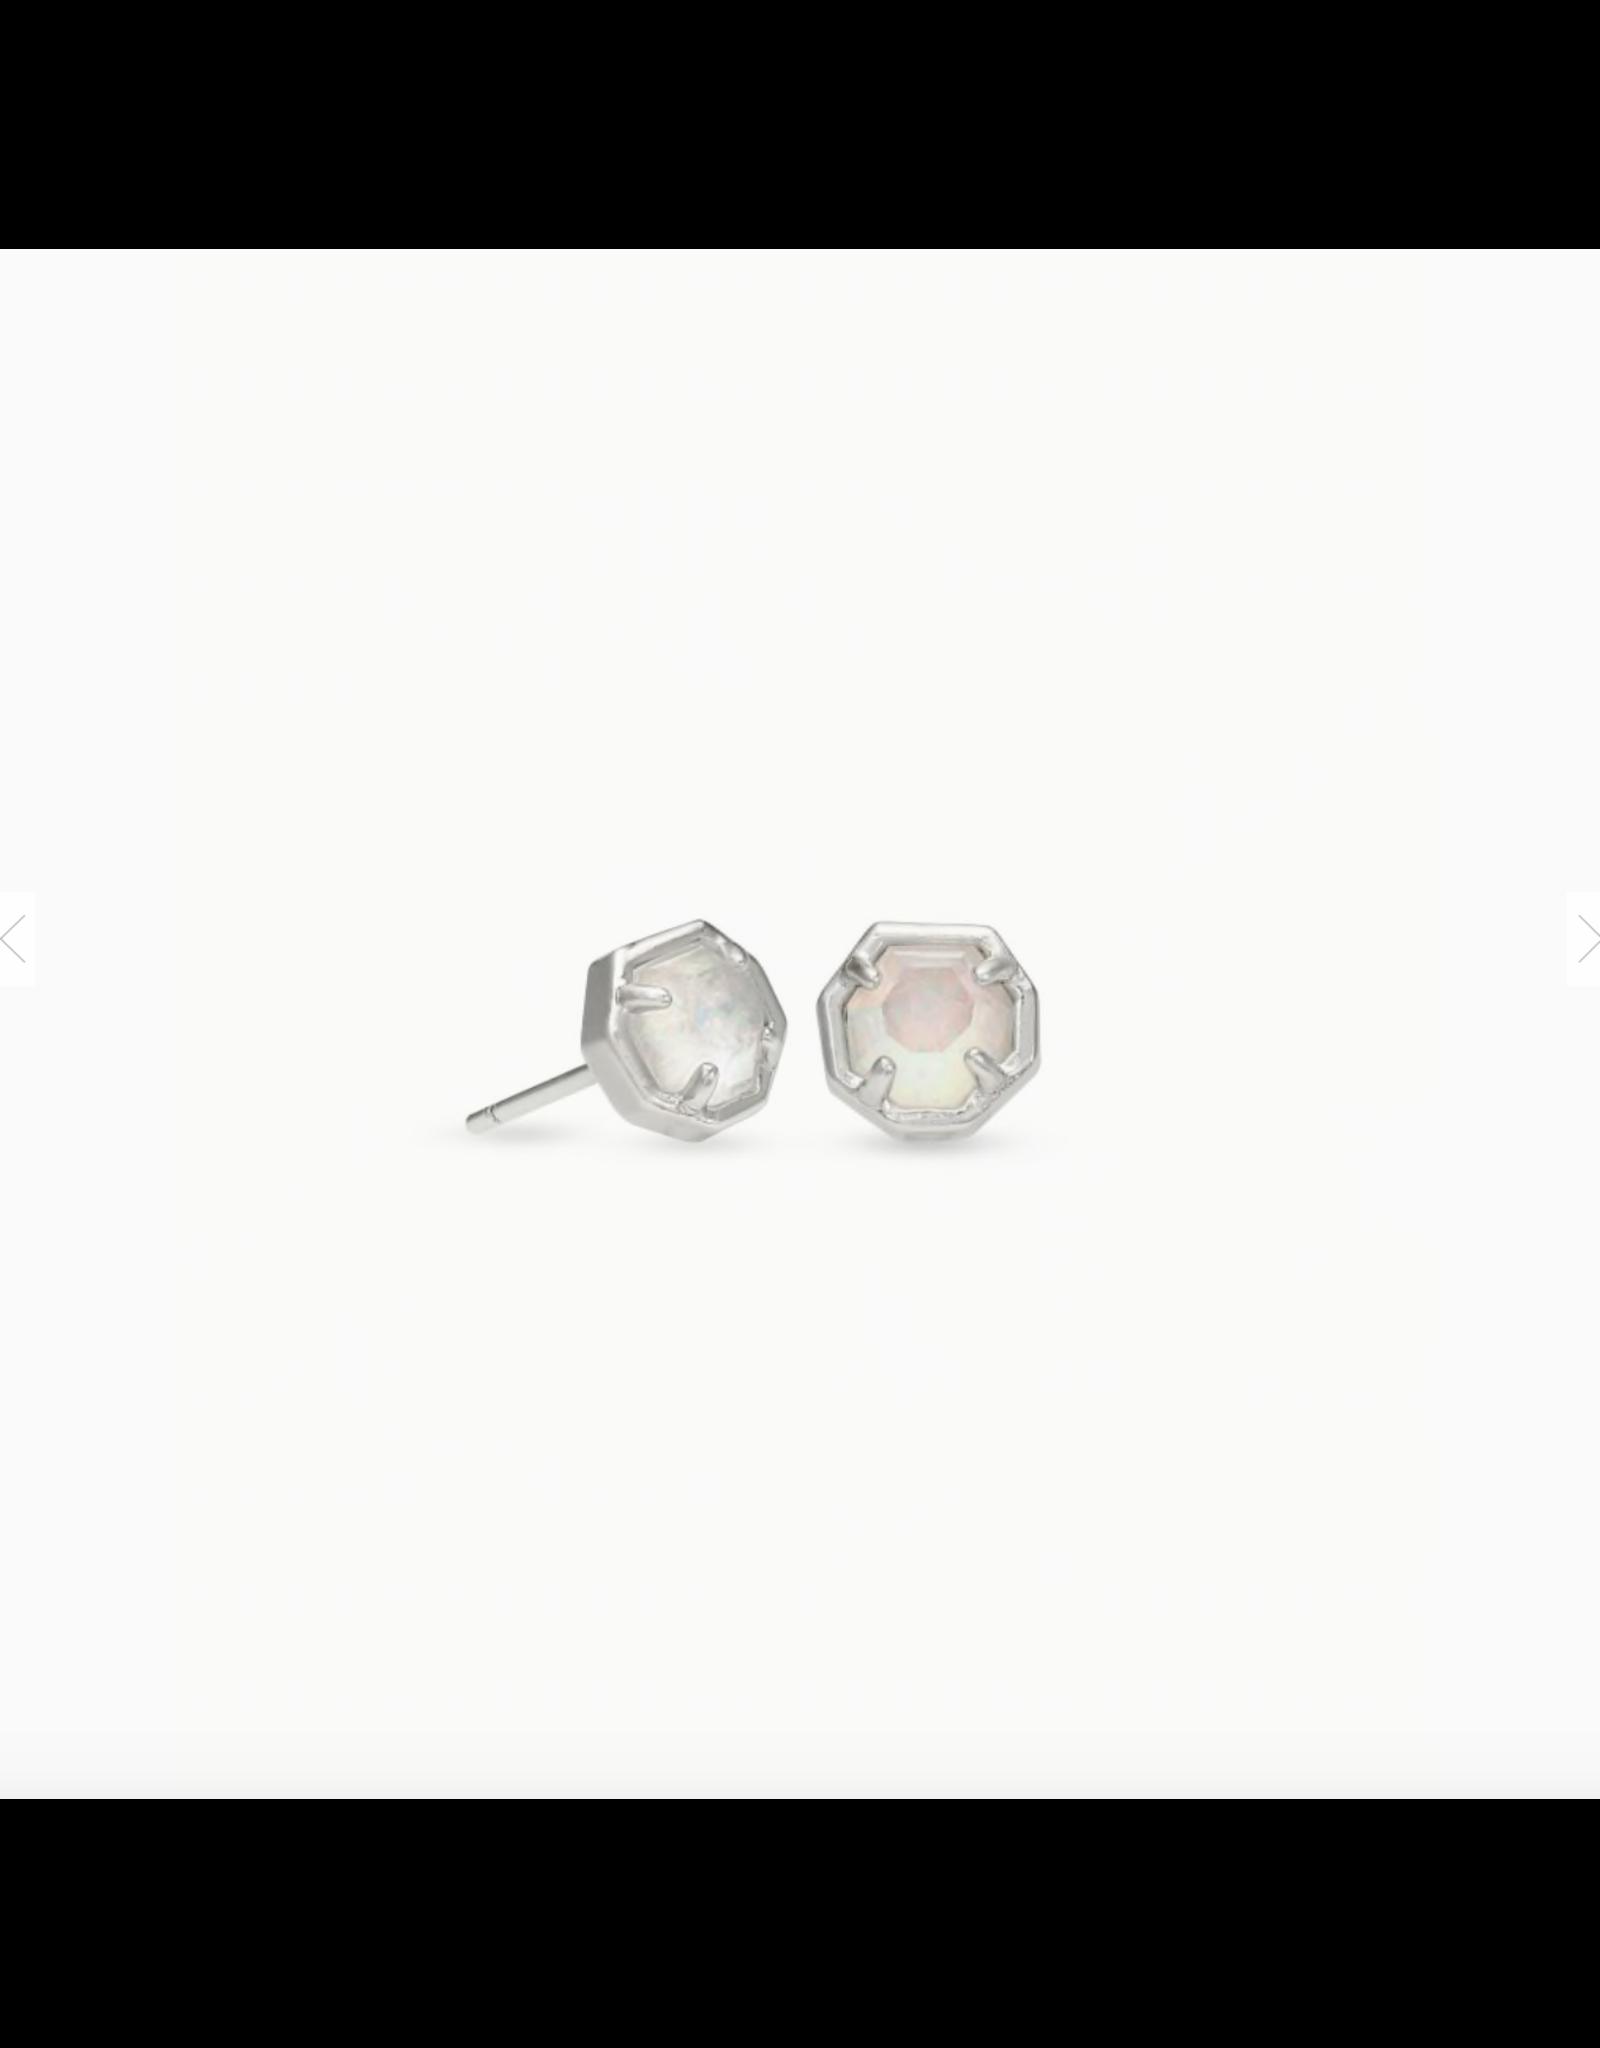 Kendra Scott Earring Nola Stud RHOD White Opal Illusion